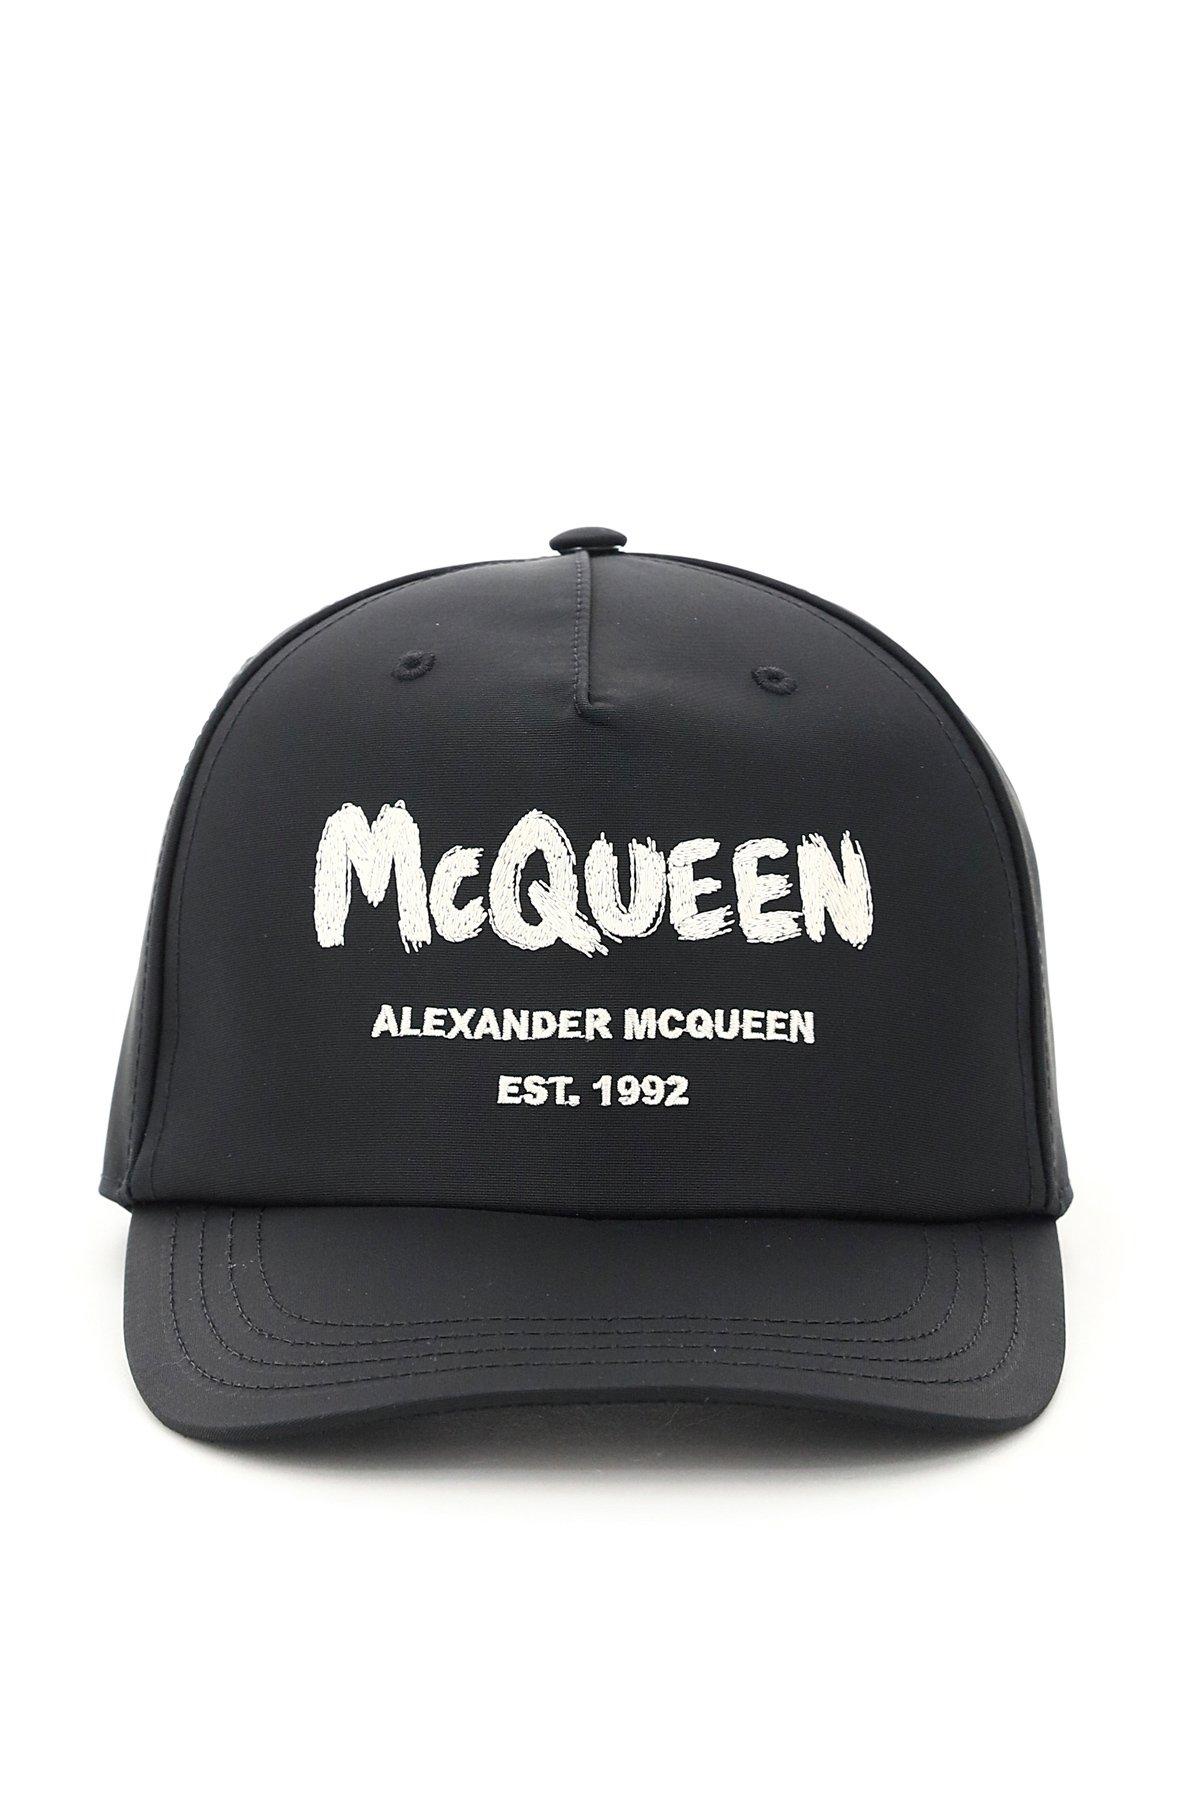 Alexander mcqueen cappello baseball logo graffiti